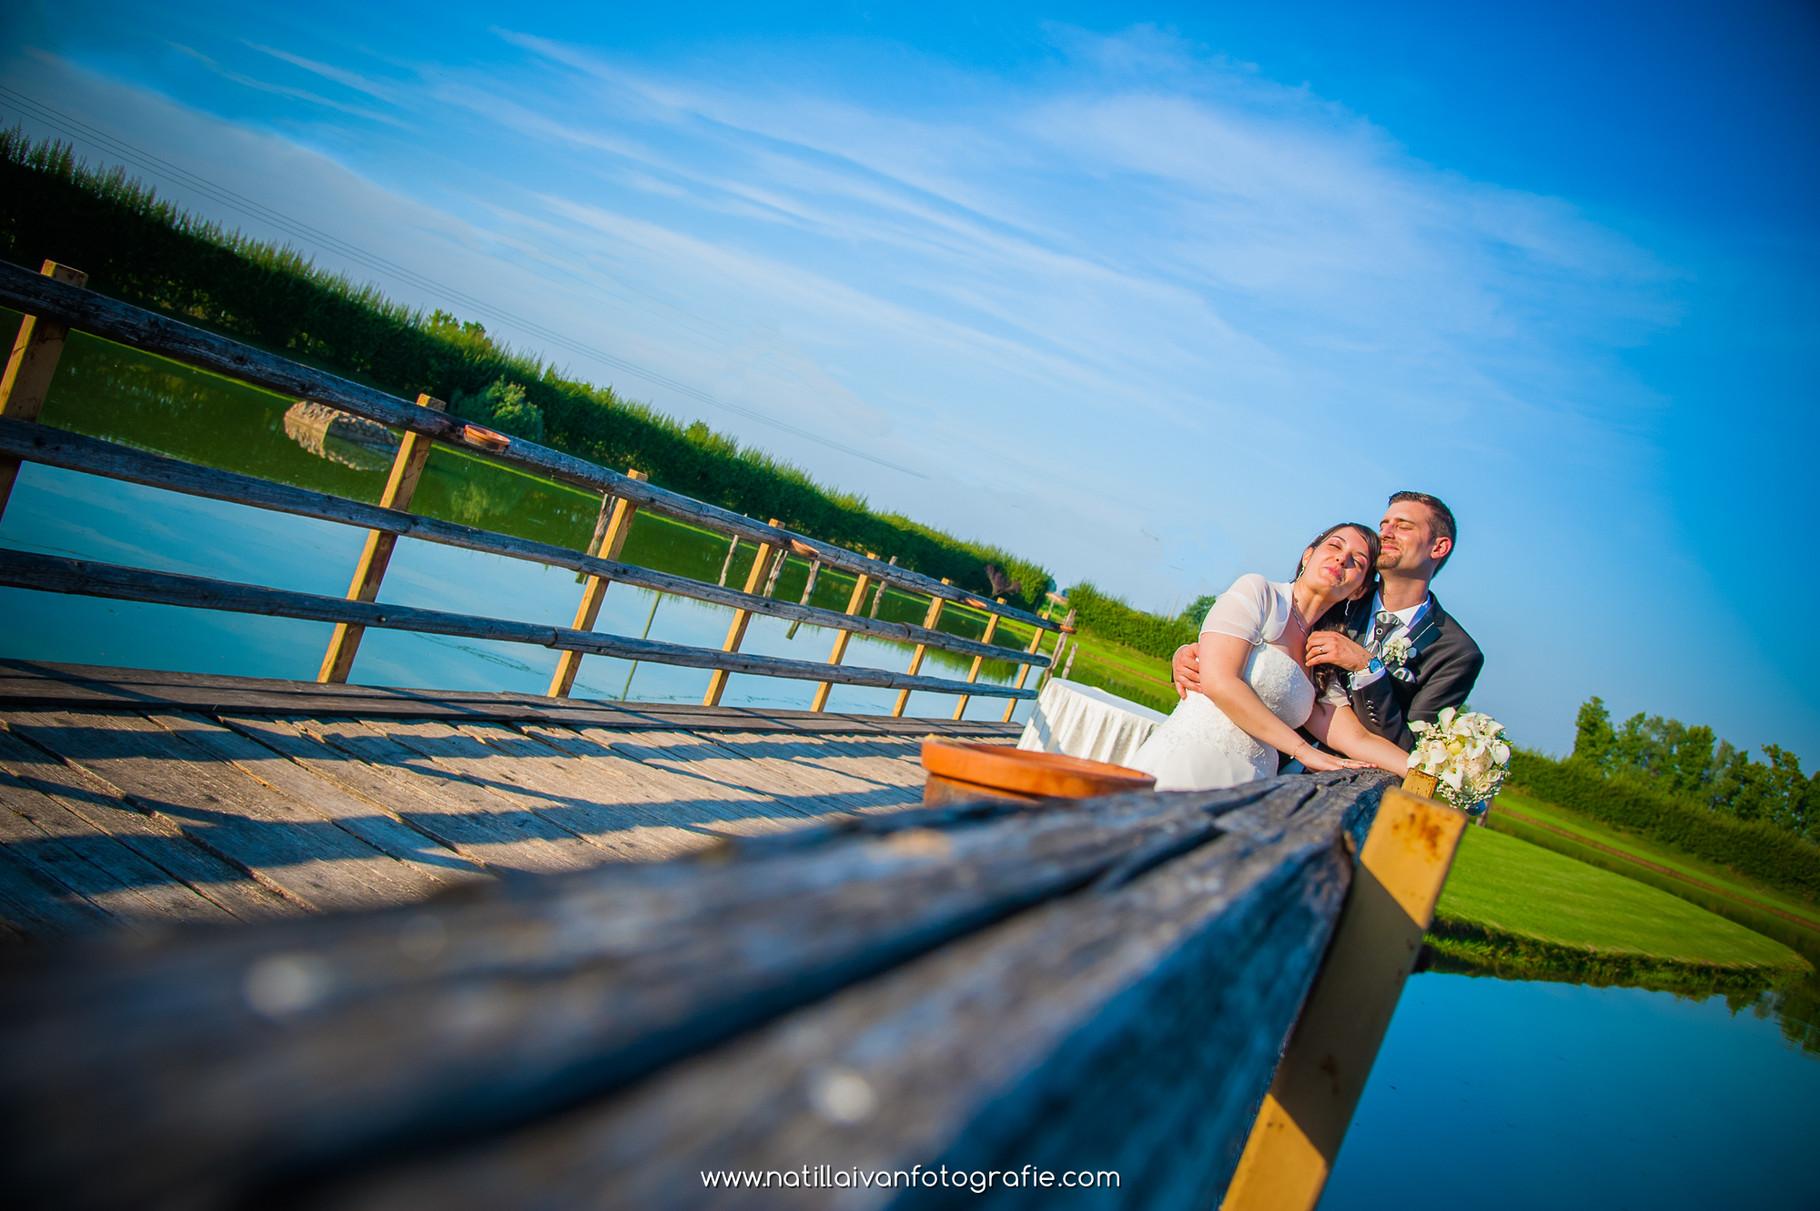 Fotografo Matrimonio Cremona - Matrimonio Sara e Marco